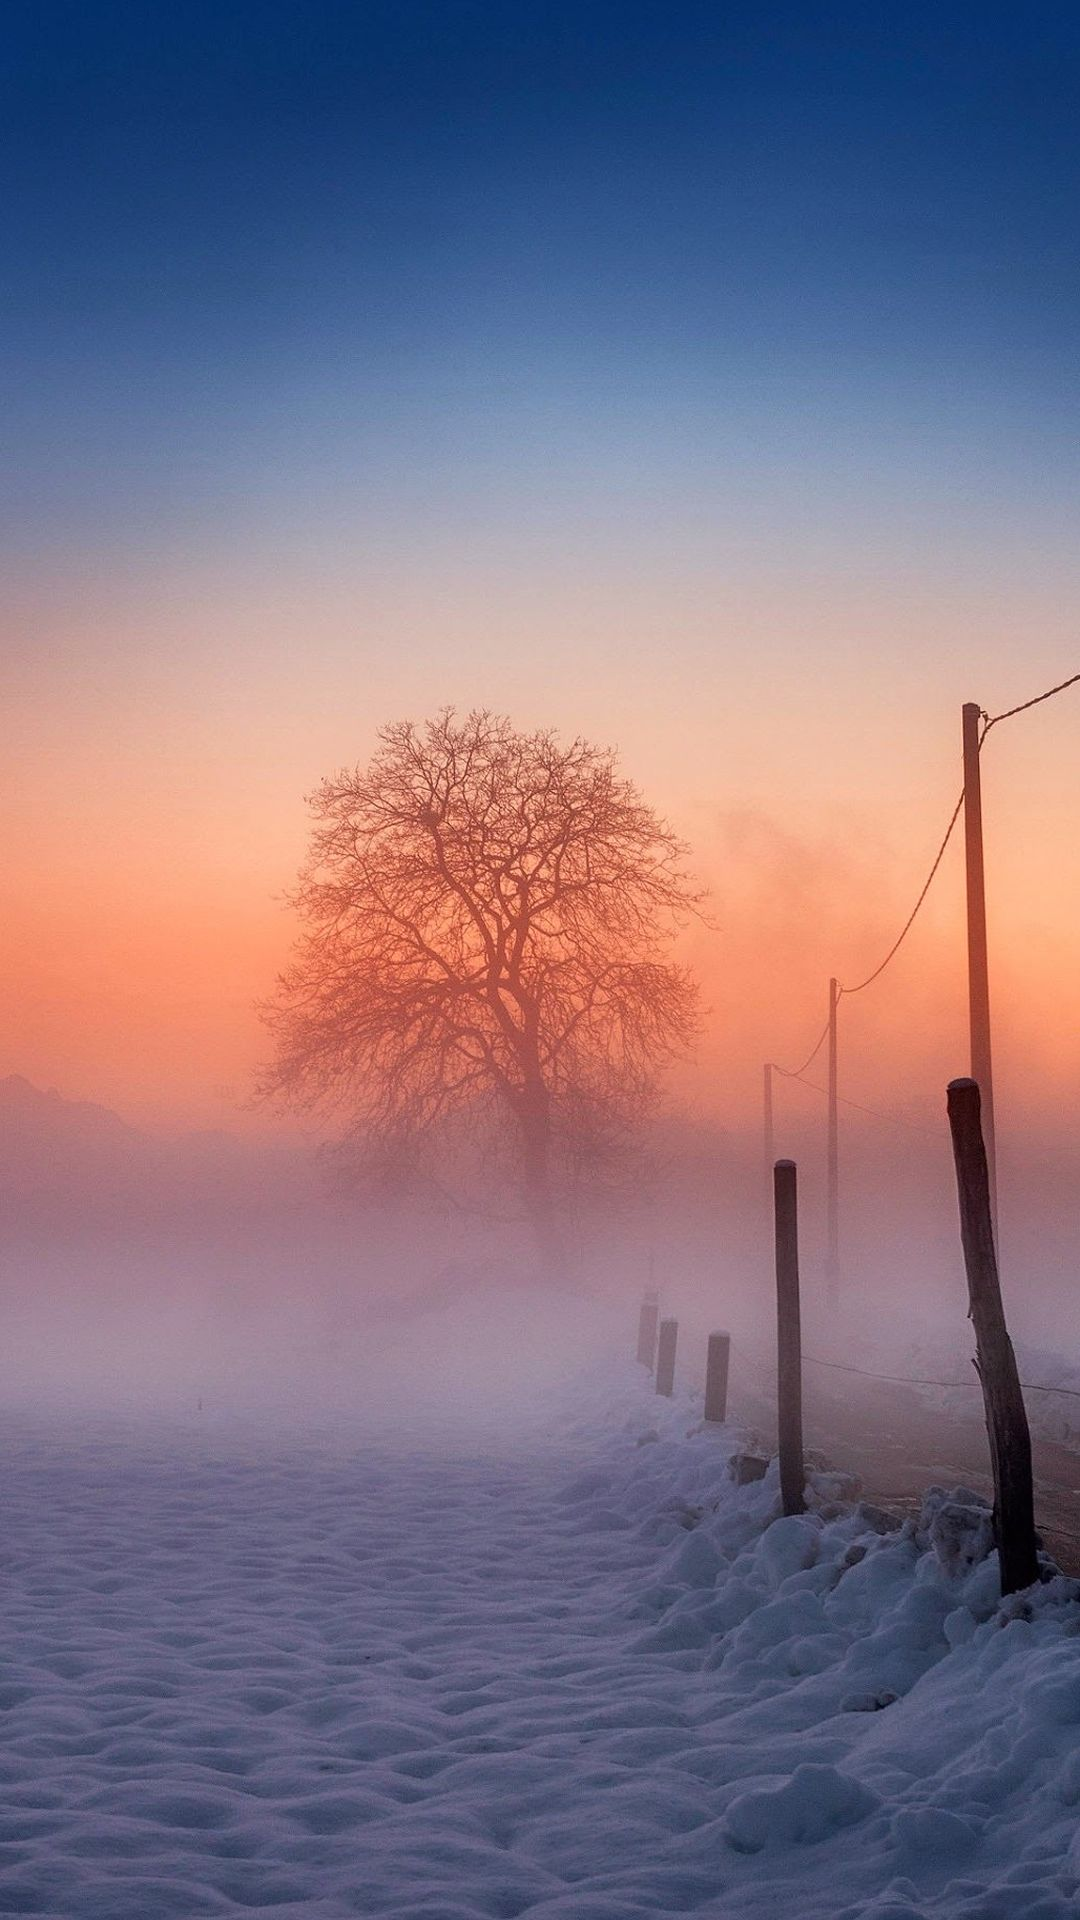 Winter Scene Fog Glow Iphone 6 Plus Wallpaper 冬の景色 冬の